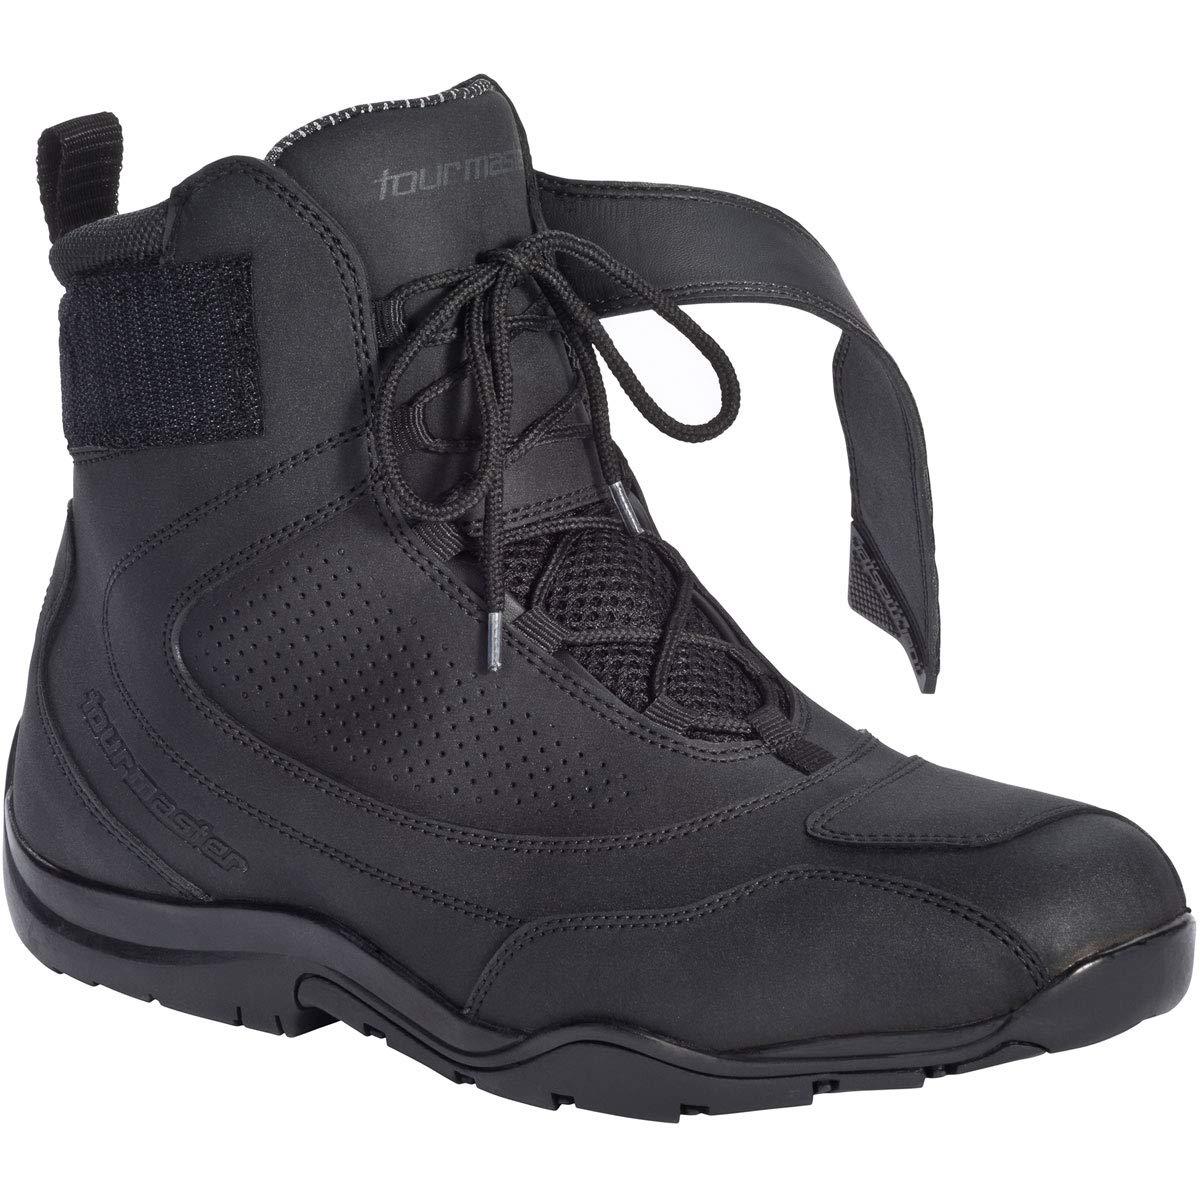 Tour Master Response 3.0 Boots Men's Street Motorcycle Boots - Matte Black / 12.5